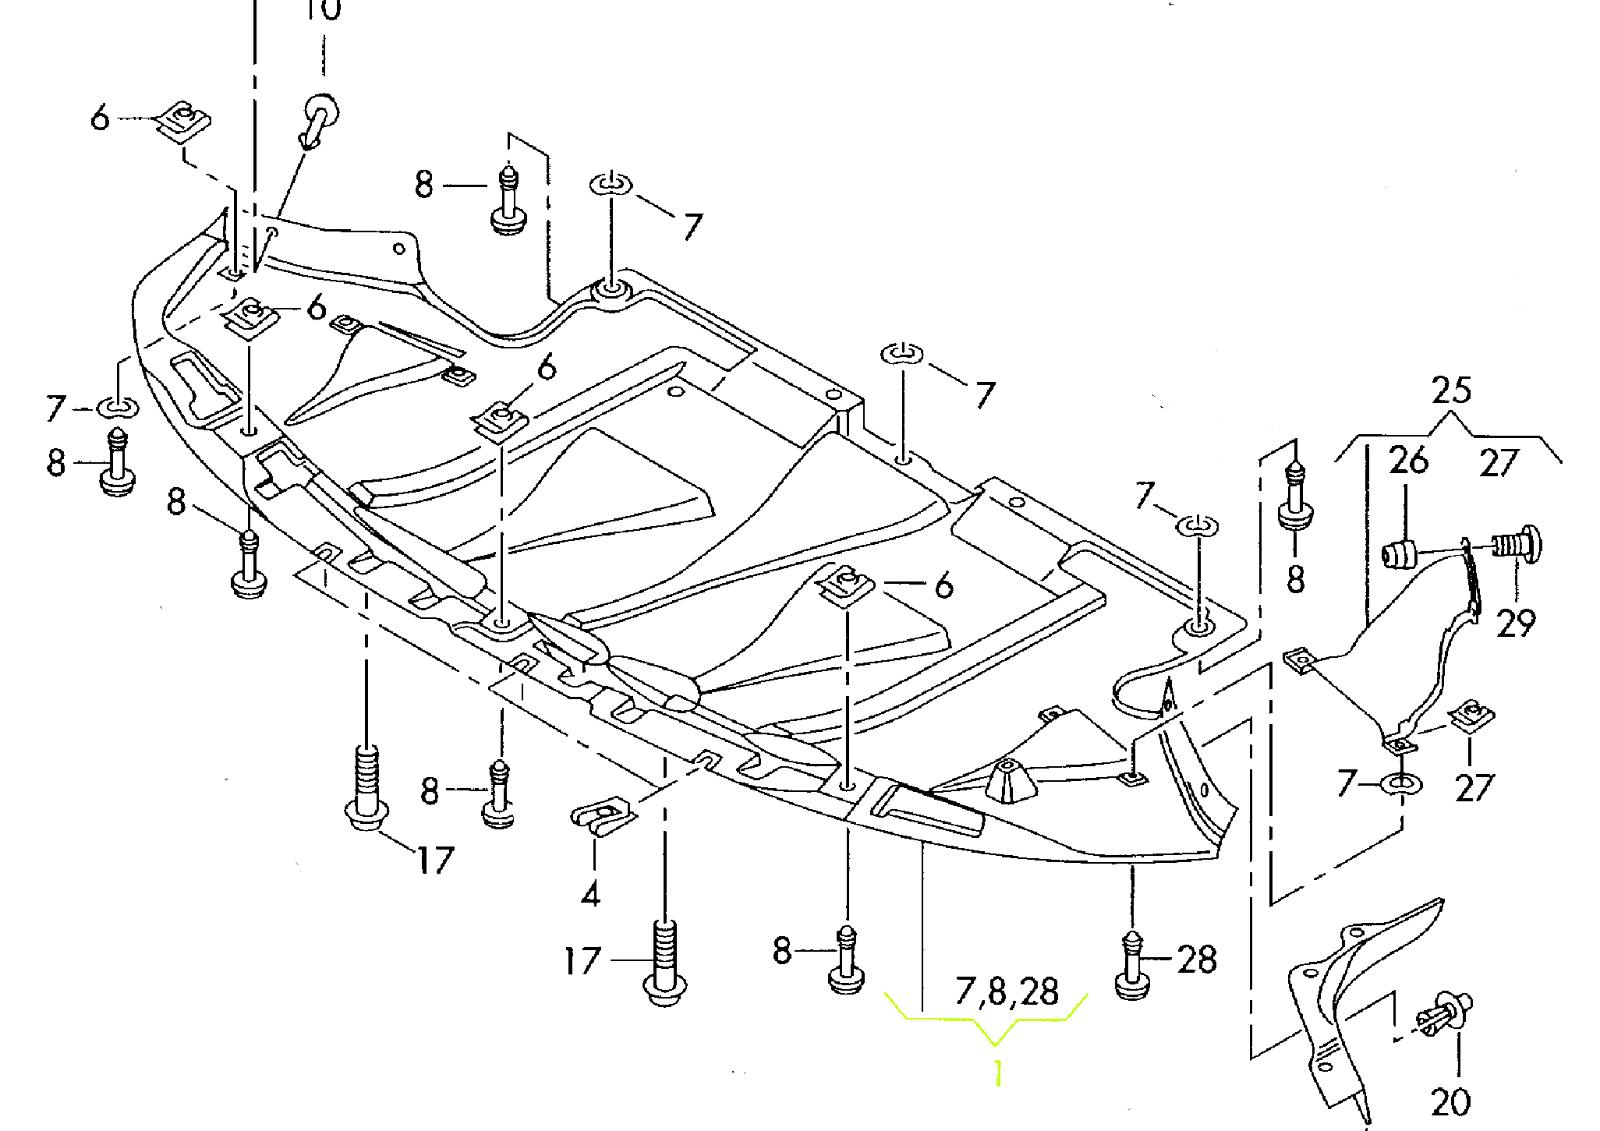 AU1228113 NEW 1998 2004 FRONT ENGINE SPLASH SHIELD FOR AUDI A6 S6 A6 QUATTRO